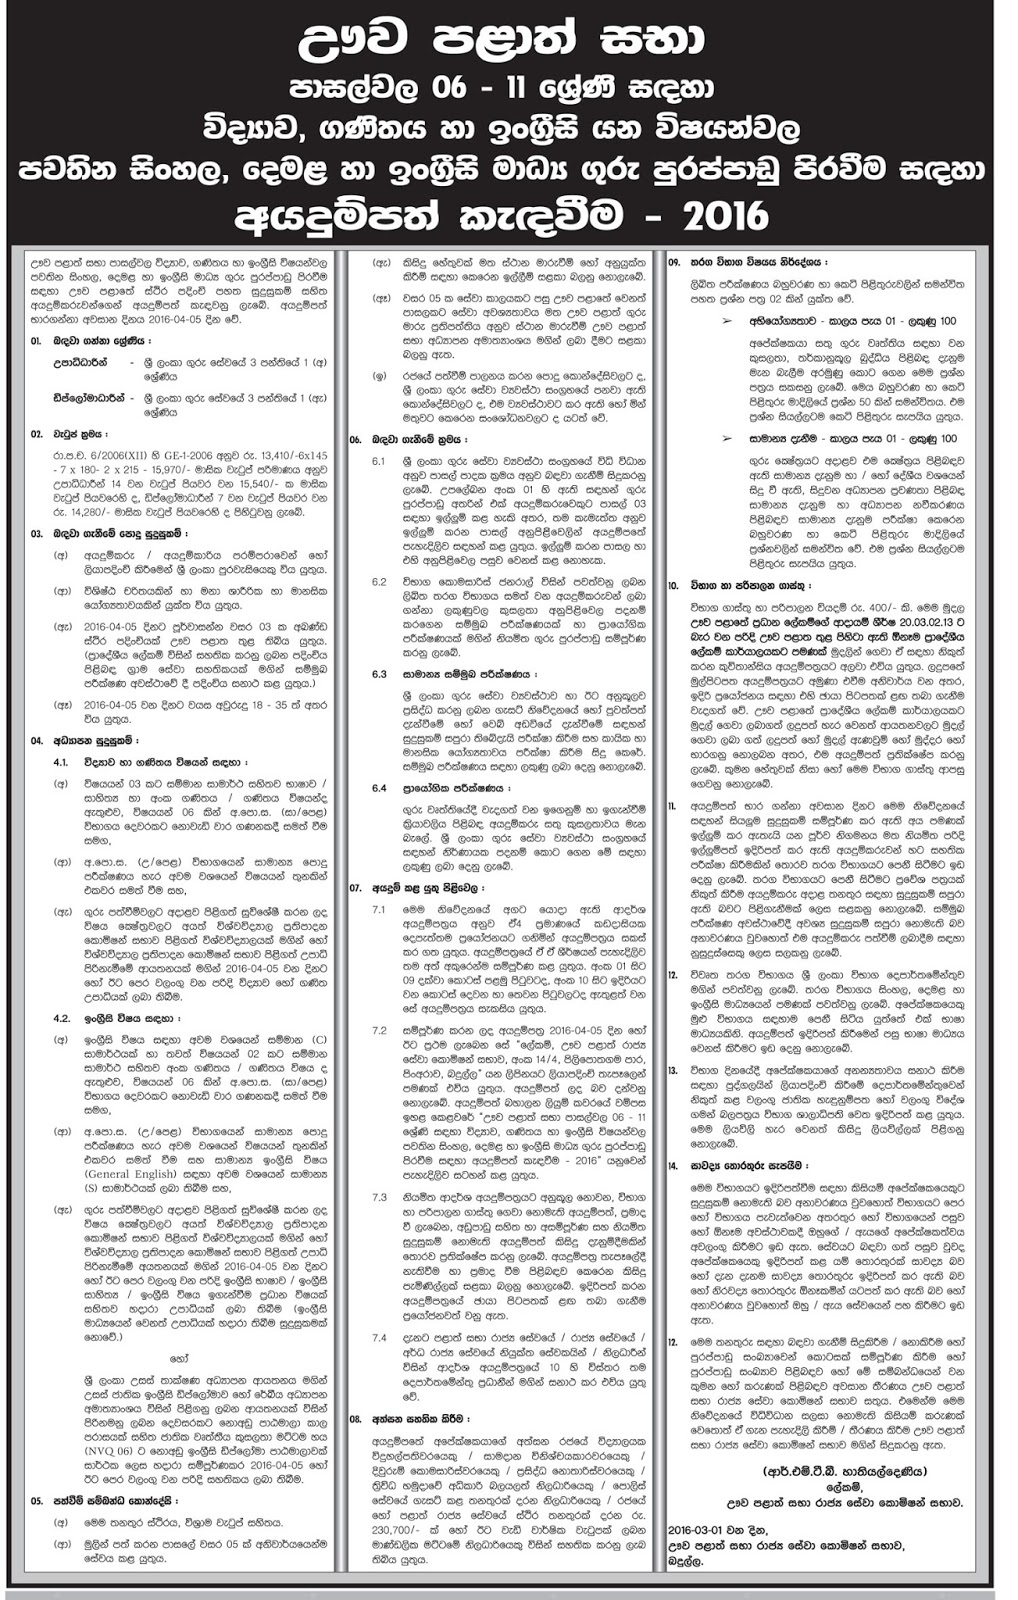 Vacancies - Uva Provincial Council schools 06 - 11 śrēṇiya for Science, Mathematics and English subjects in Sinhala, Tamil and English media fill vacancies